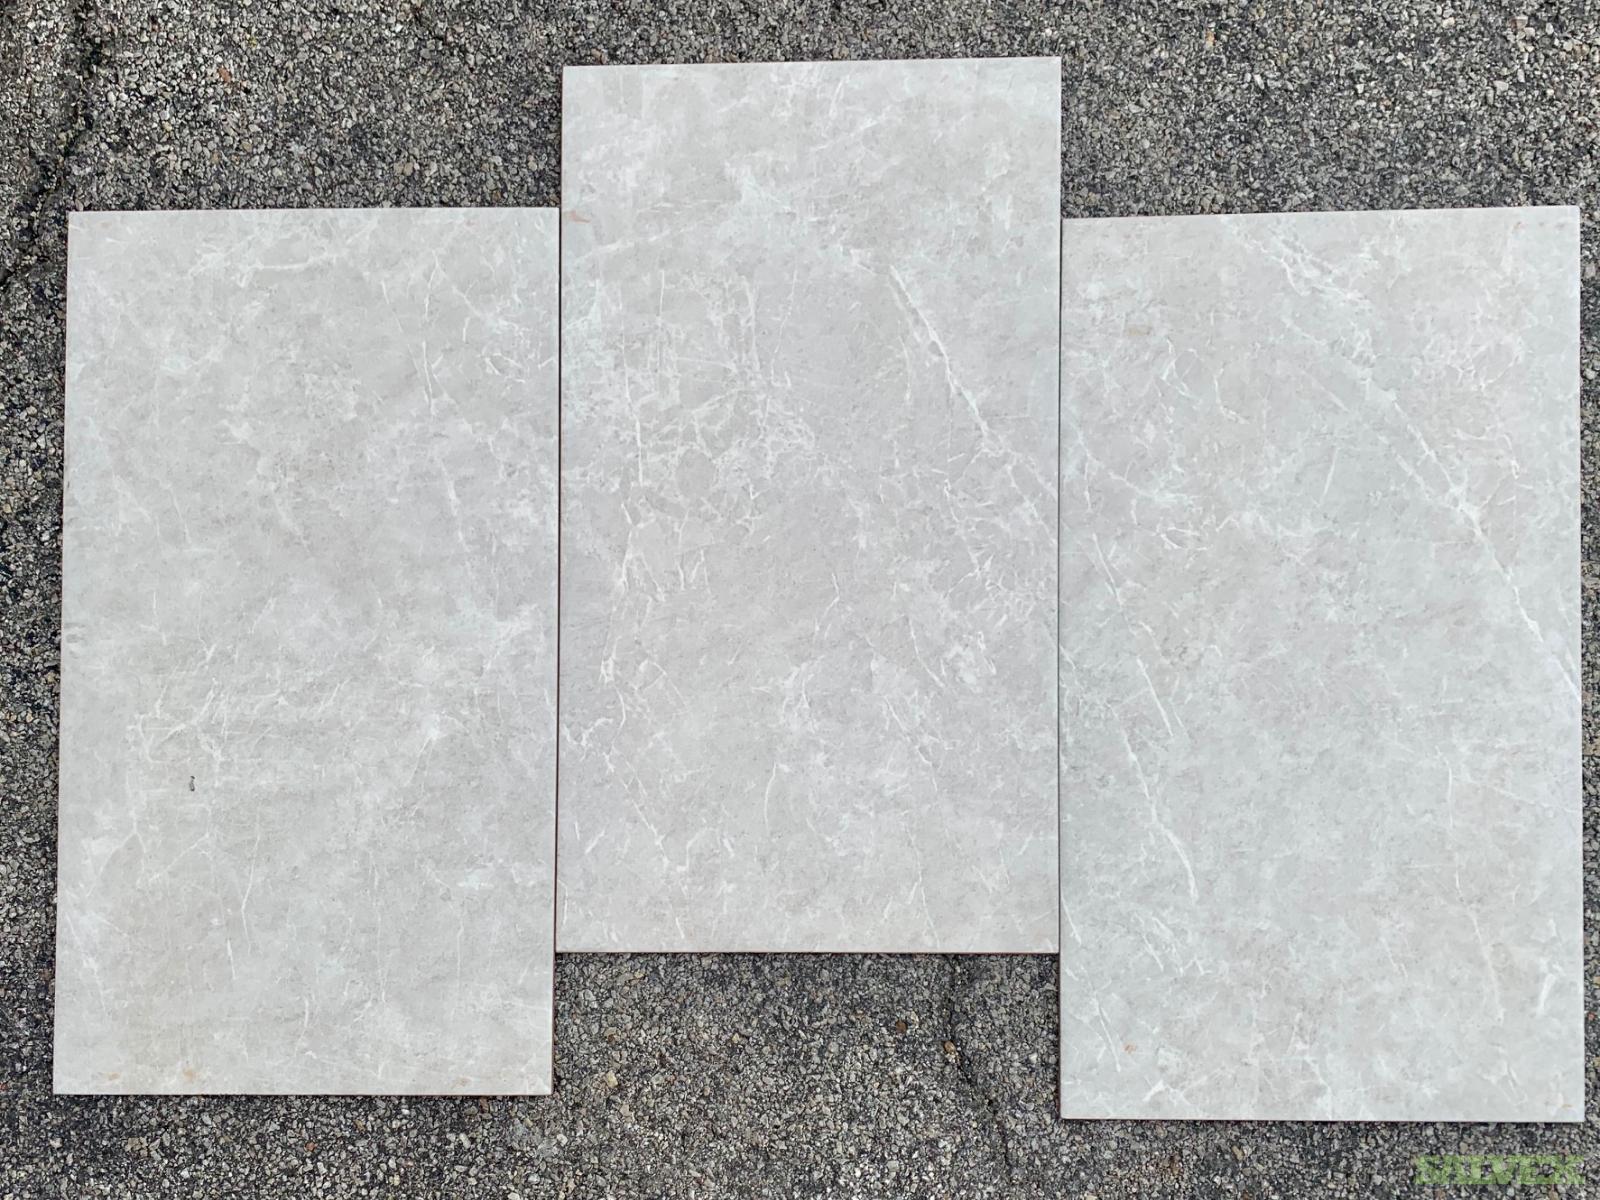 EMSER -  Ceramic Tile - Havana White 13x23 Ceramic Tile  -  6,604.78 Sqft